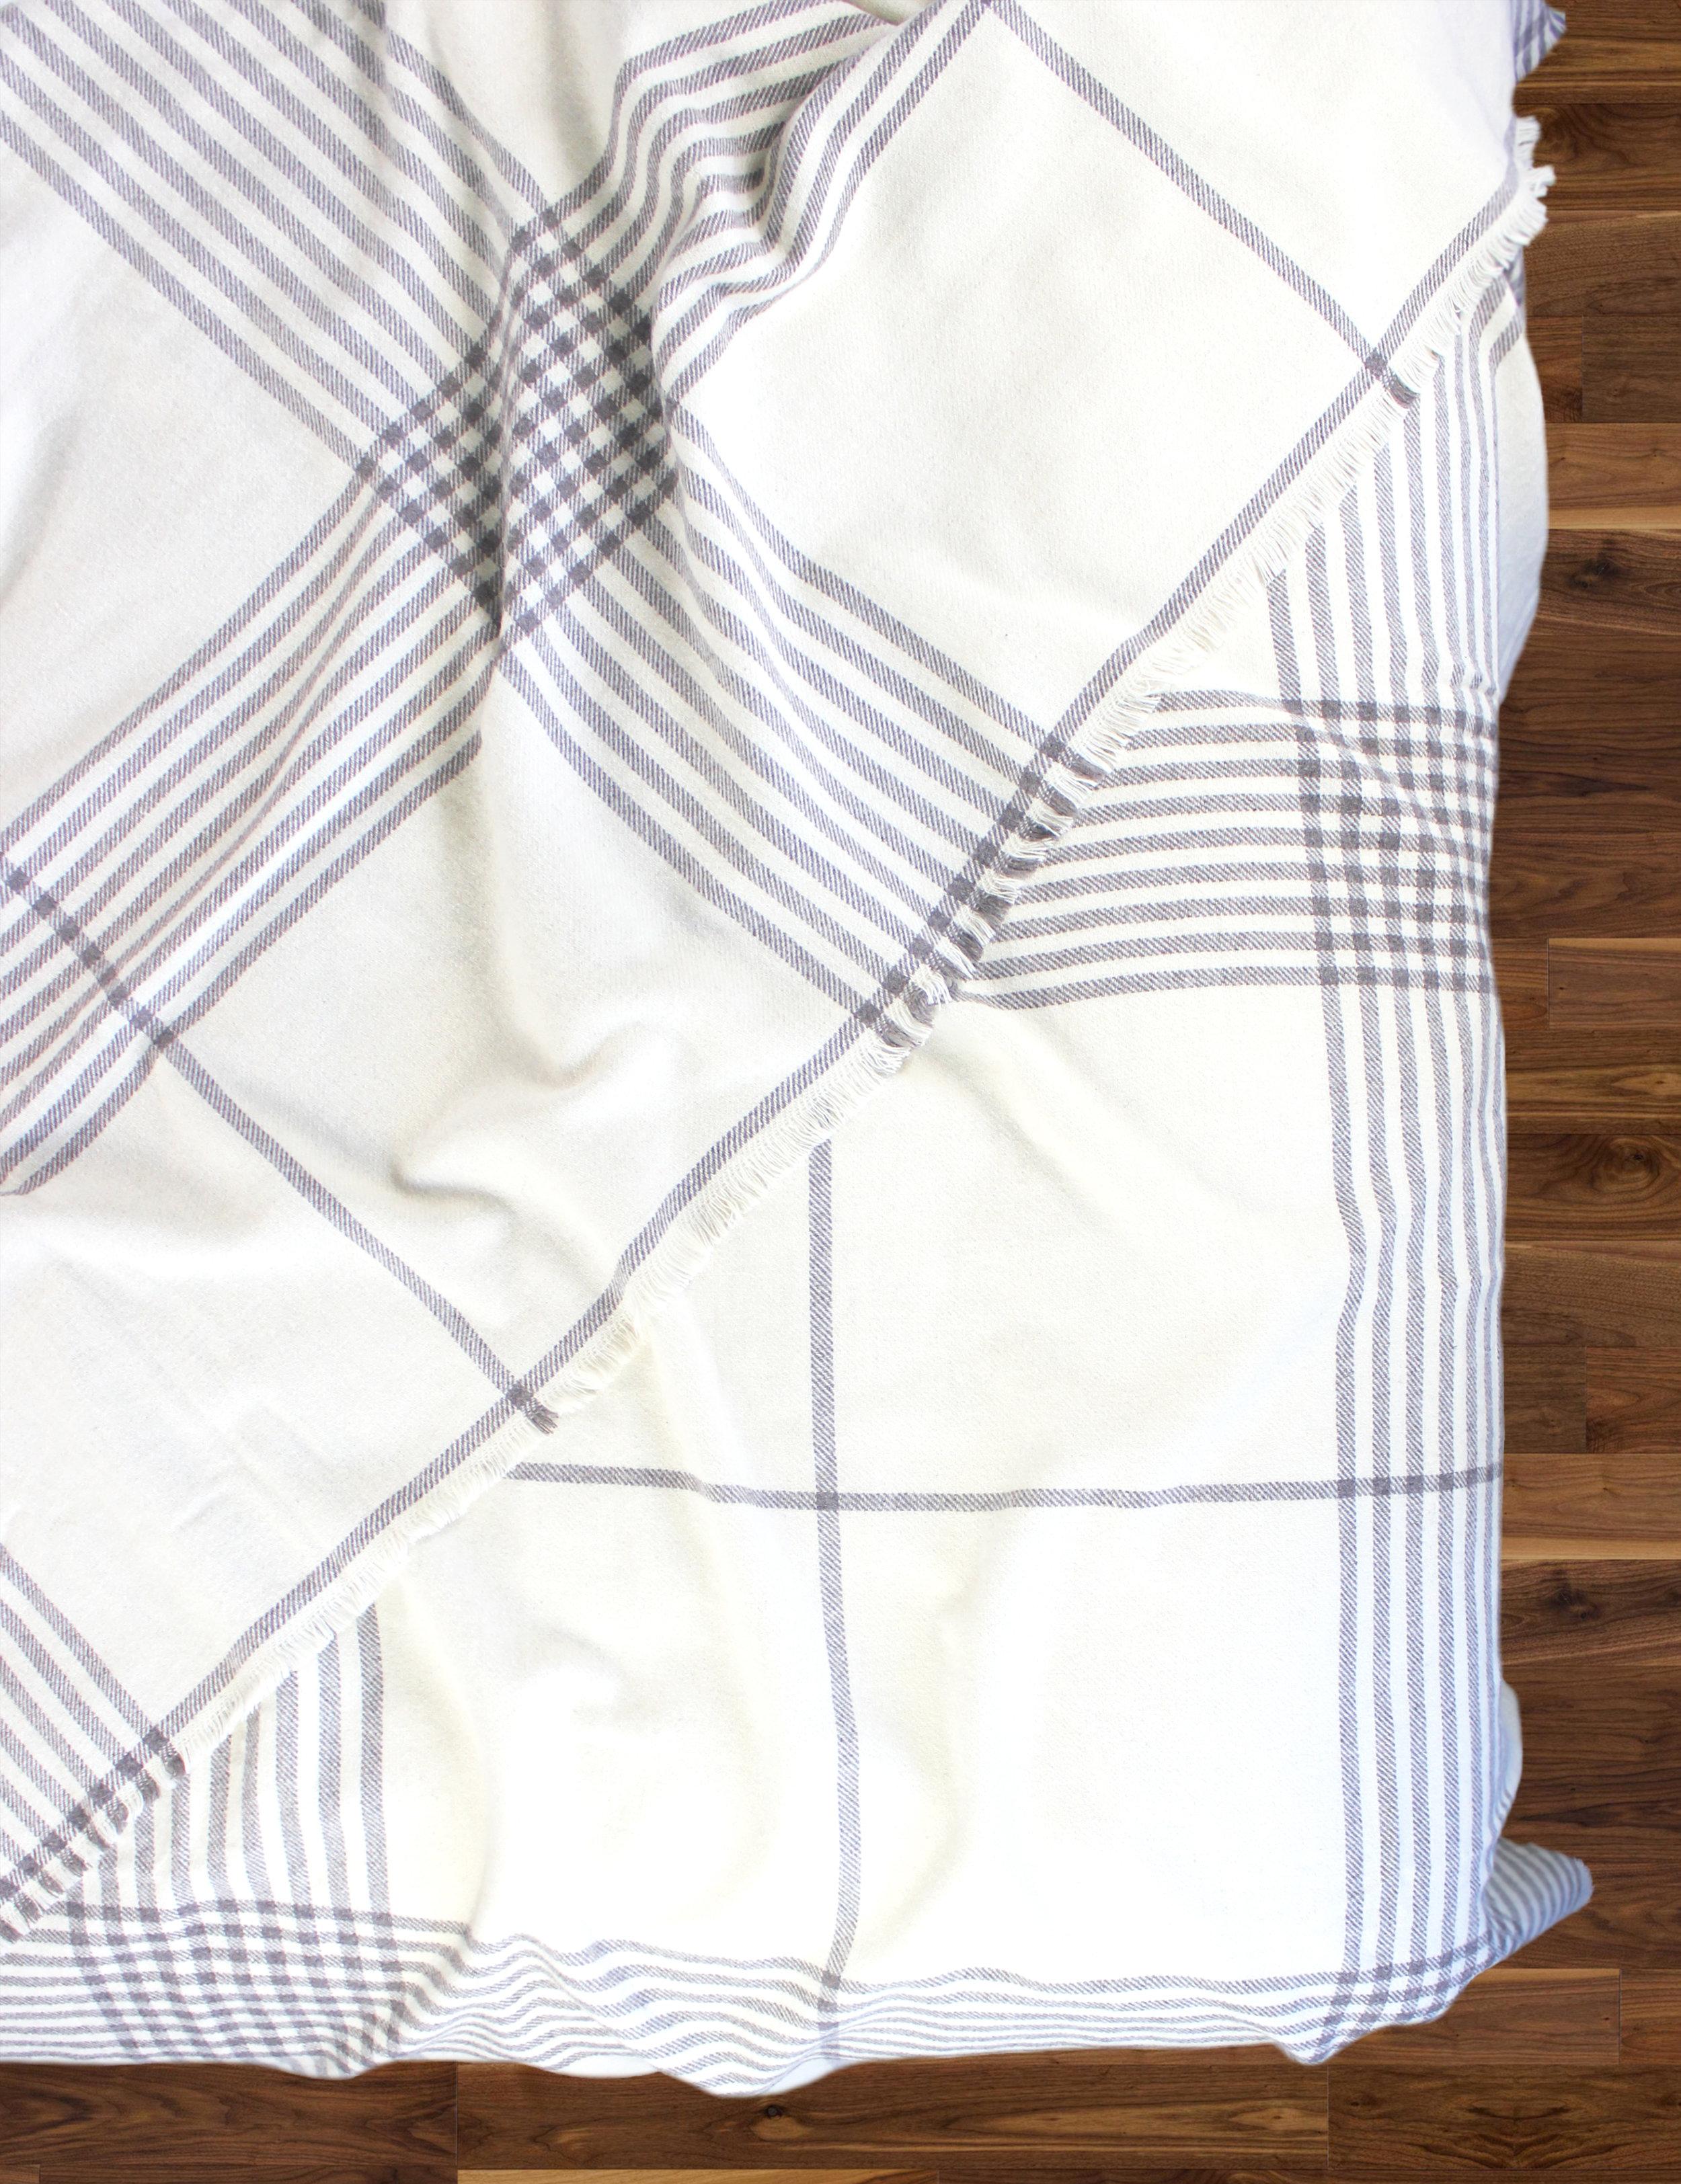 9 Bar Wool Blend Blanket_2.5.jpg